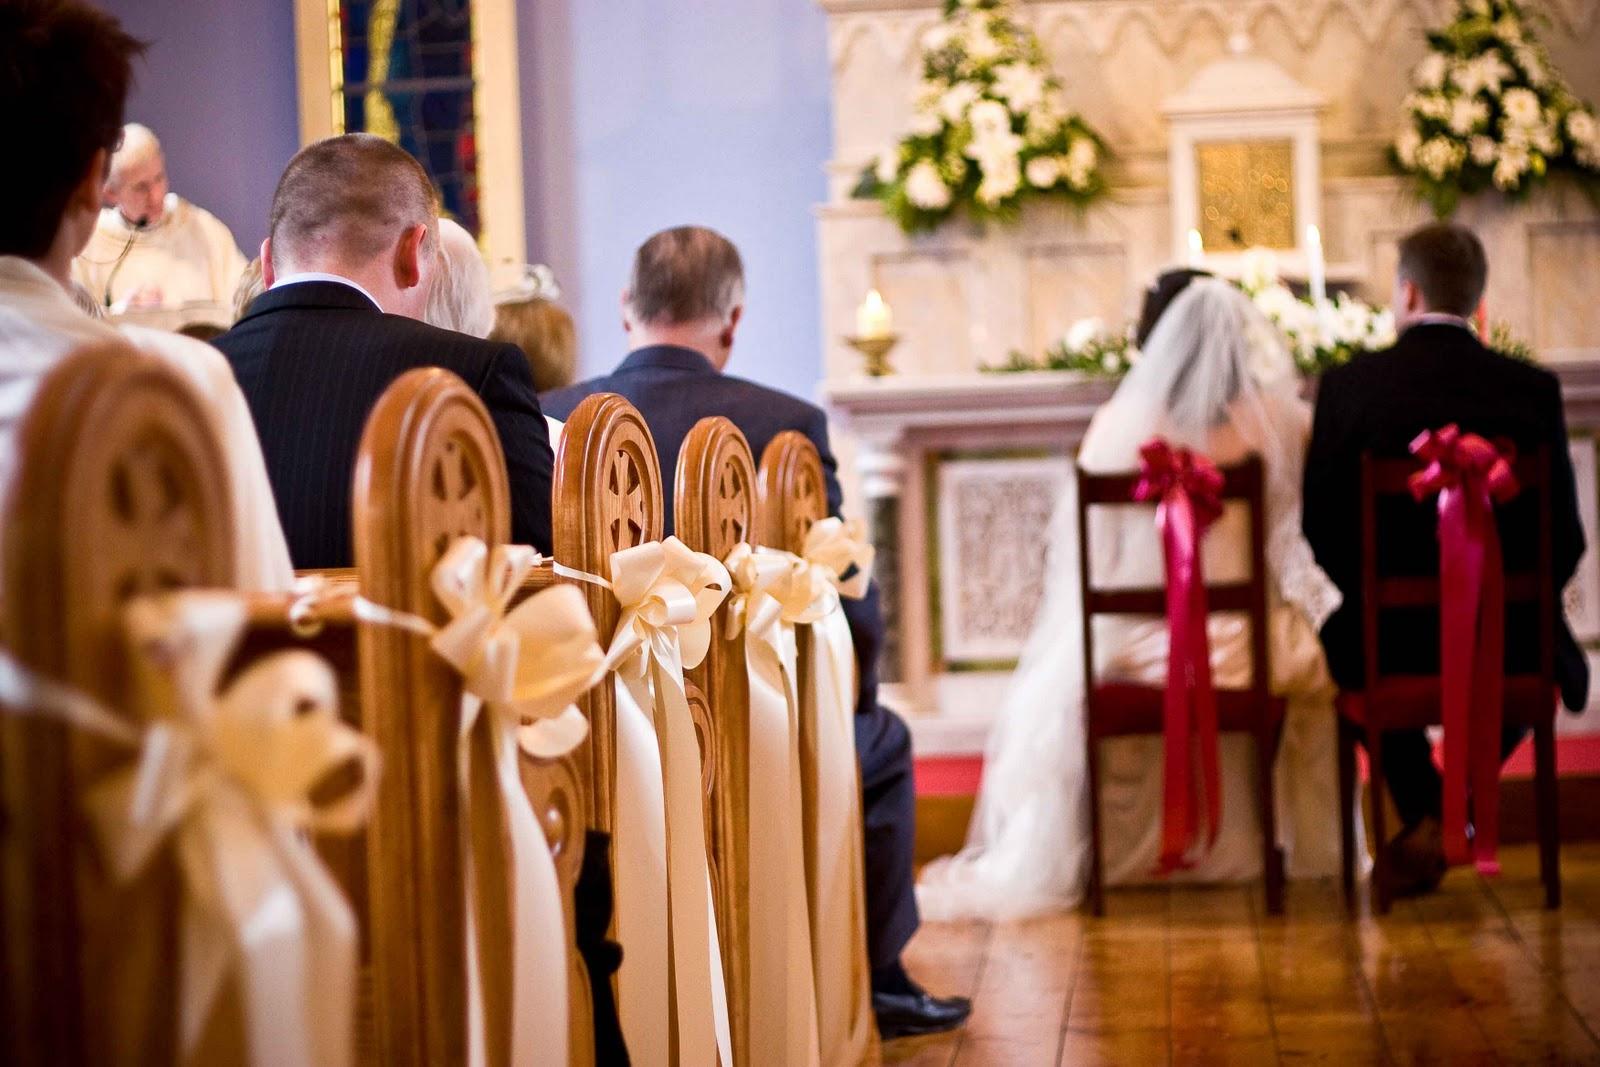 Wedding Decorations For Church Pews | Romantic Decoration